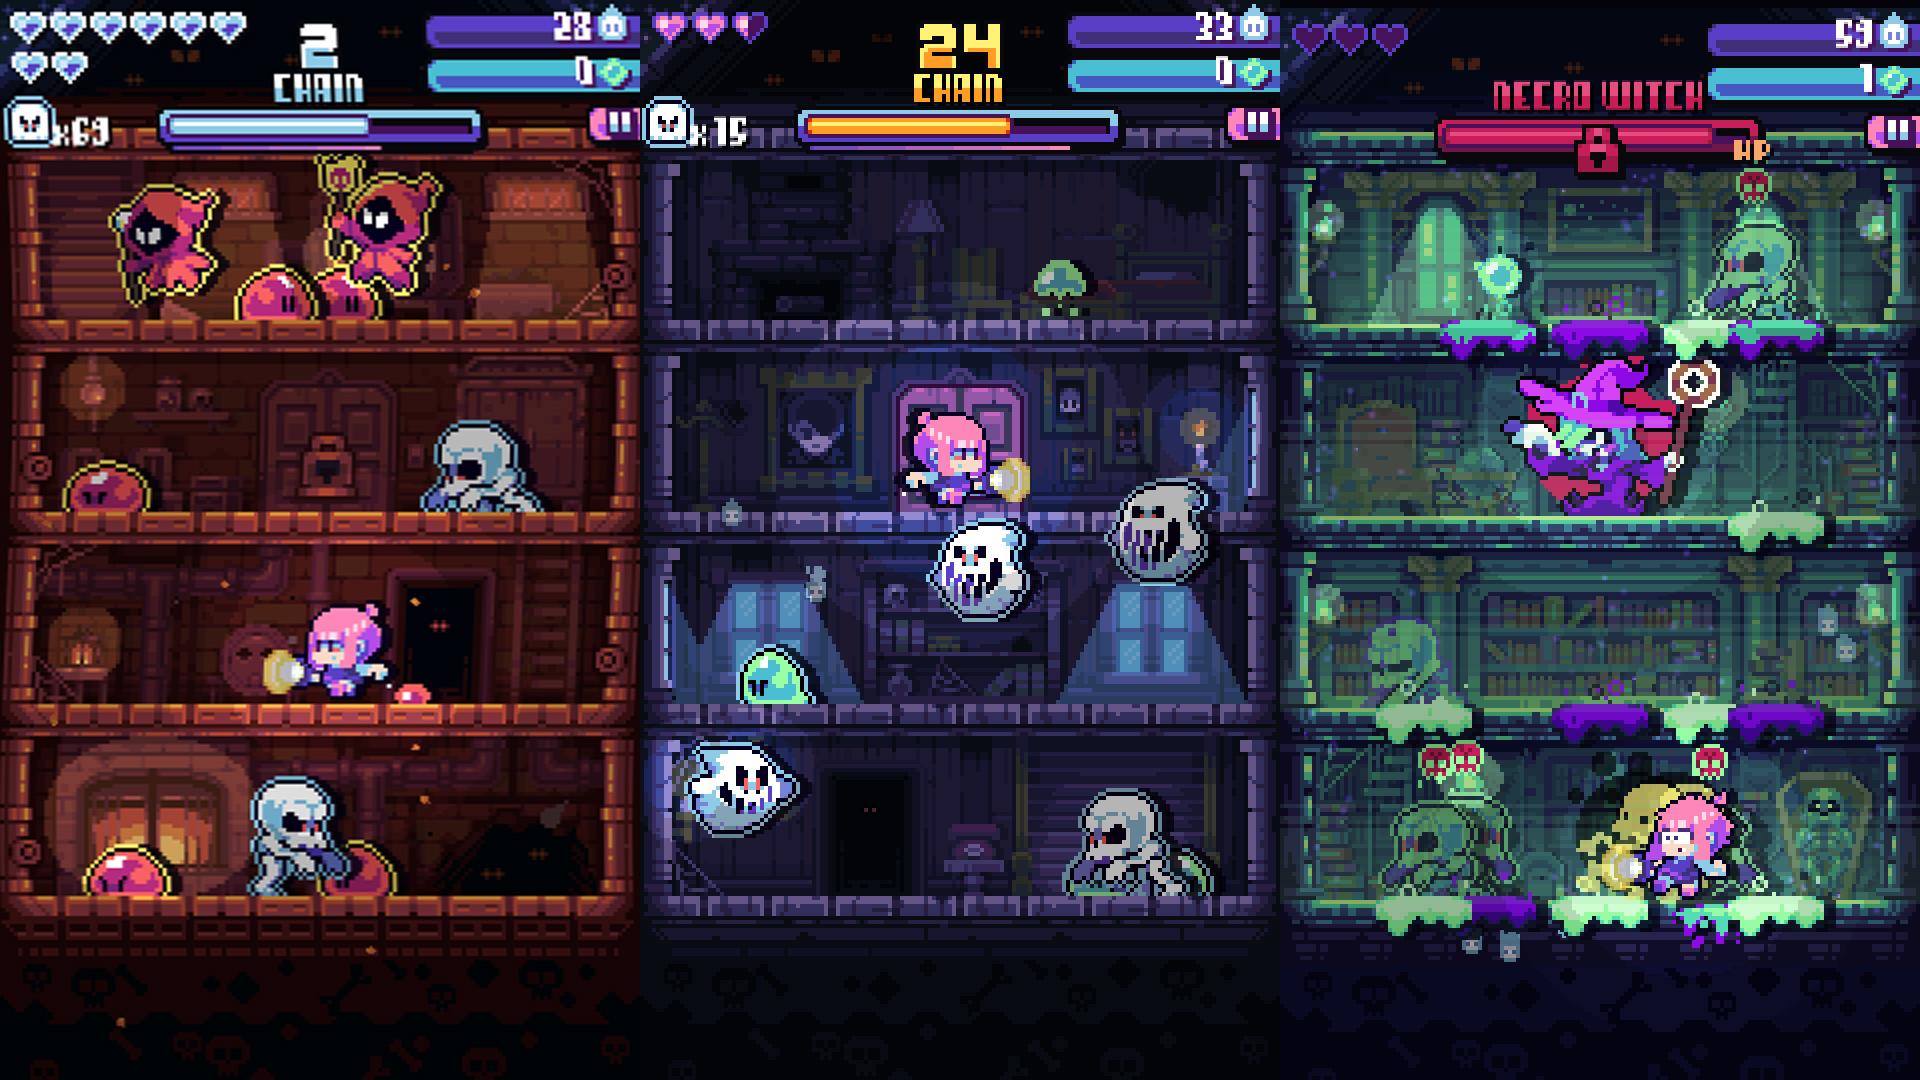 uCQDqDgLQkLpTwQiZVYCr6 - The best free Android games 2019